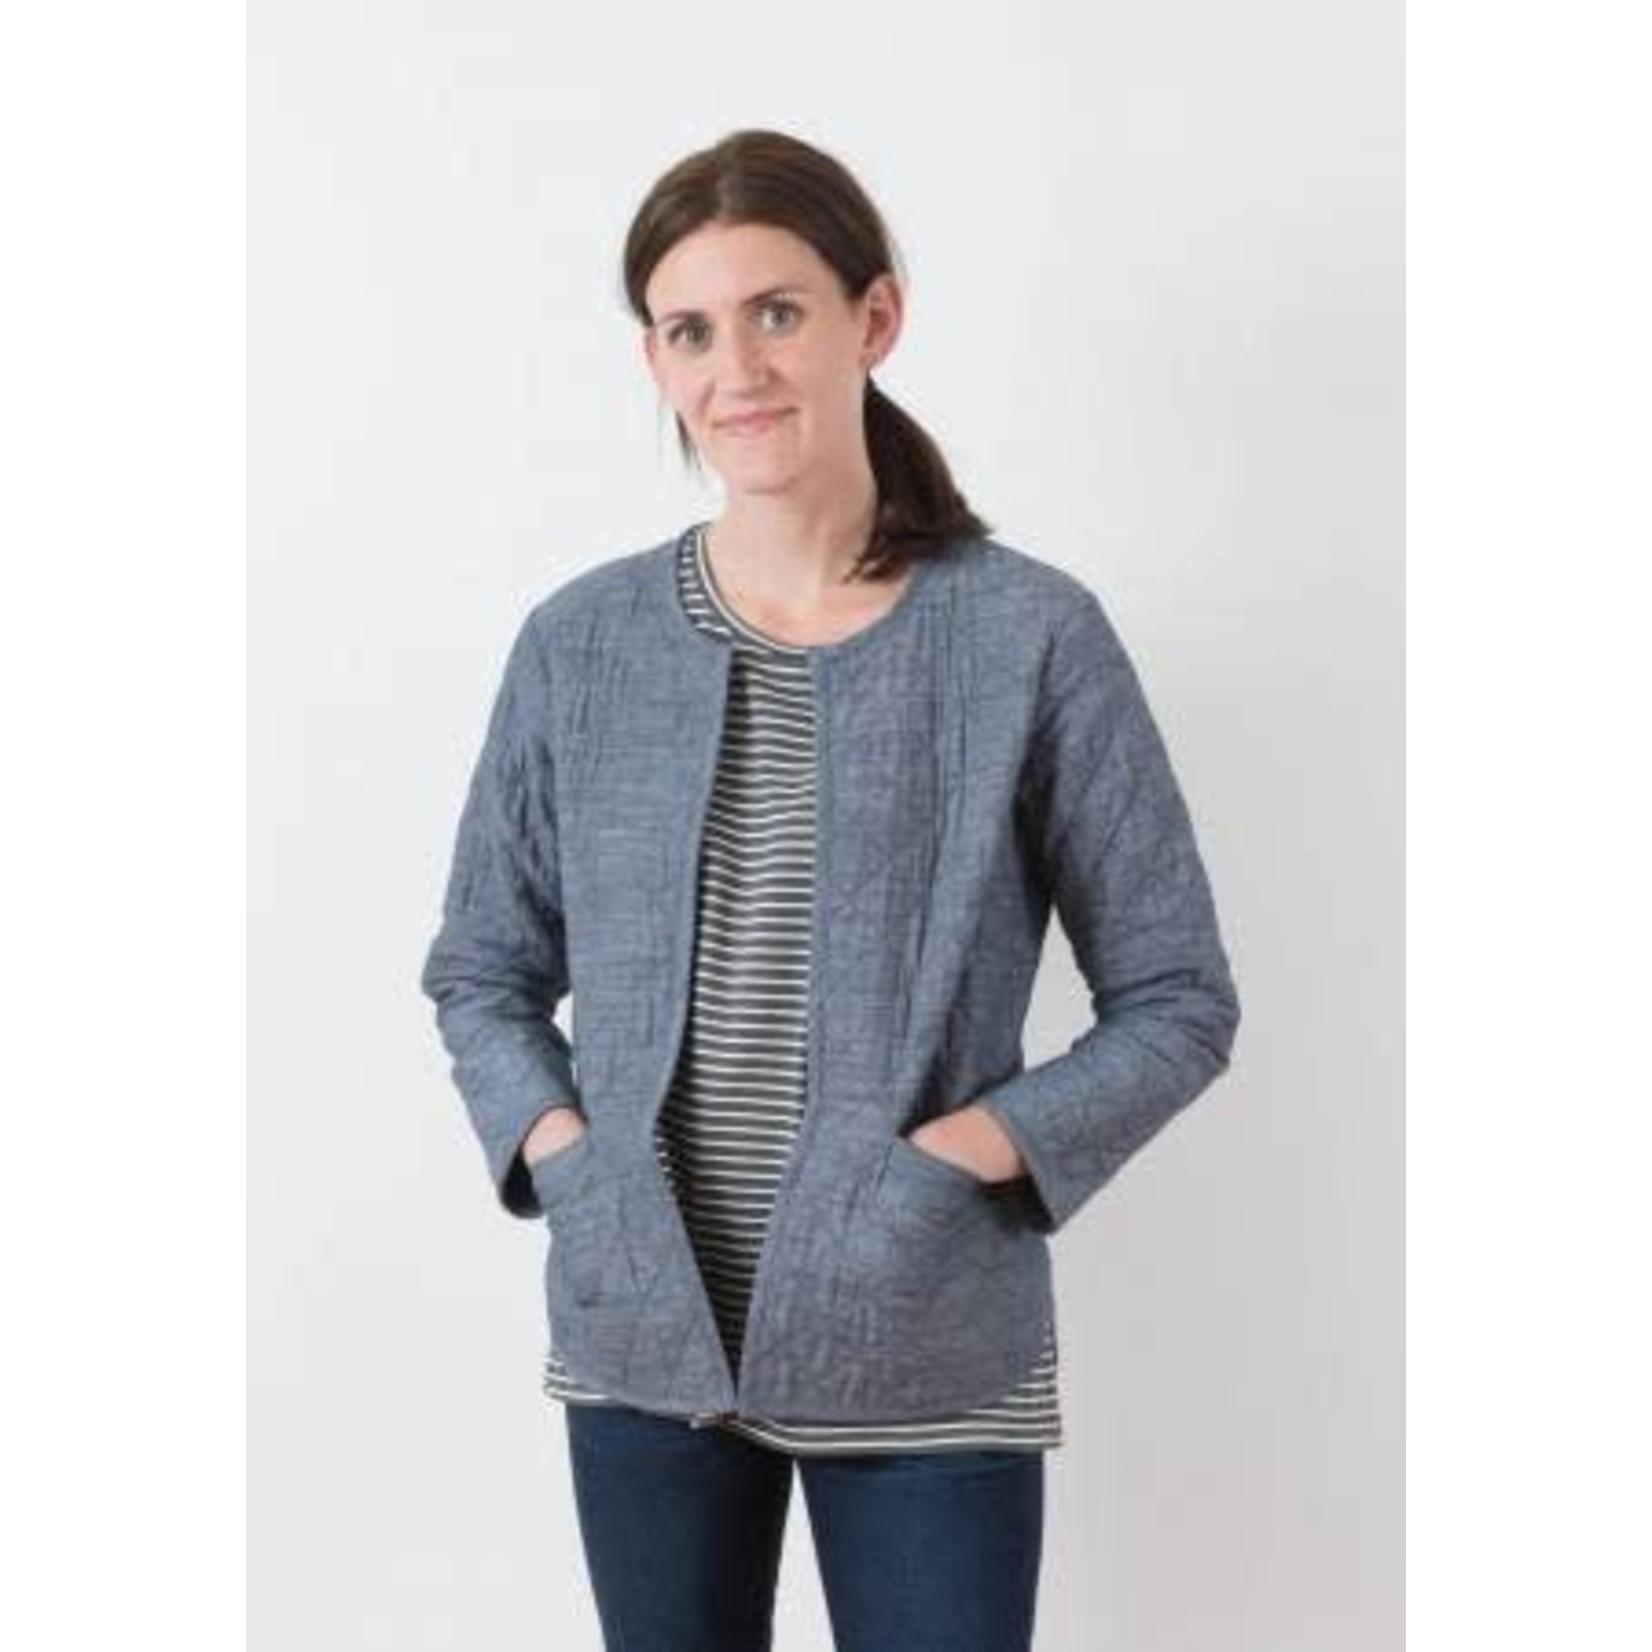 GRAINLINE STUDIO Tamarack Jacket Pattern